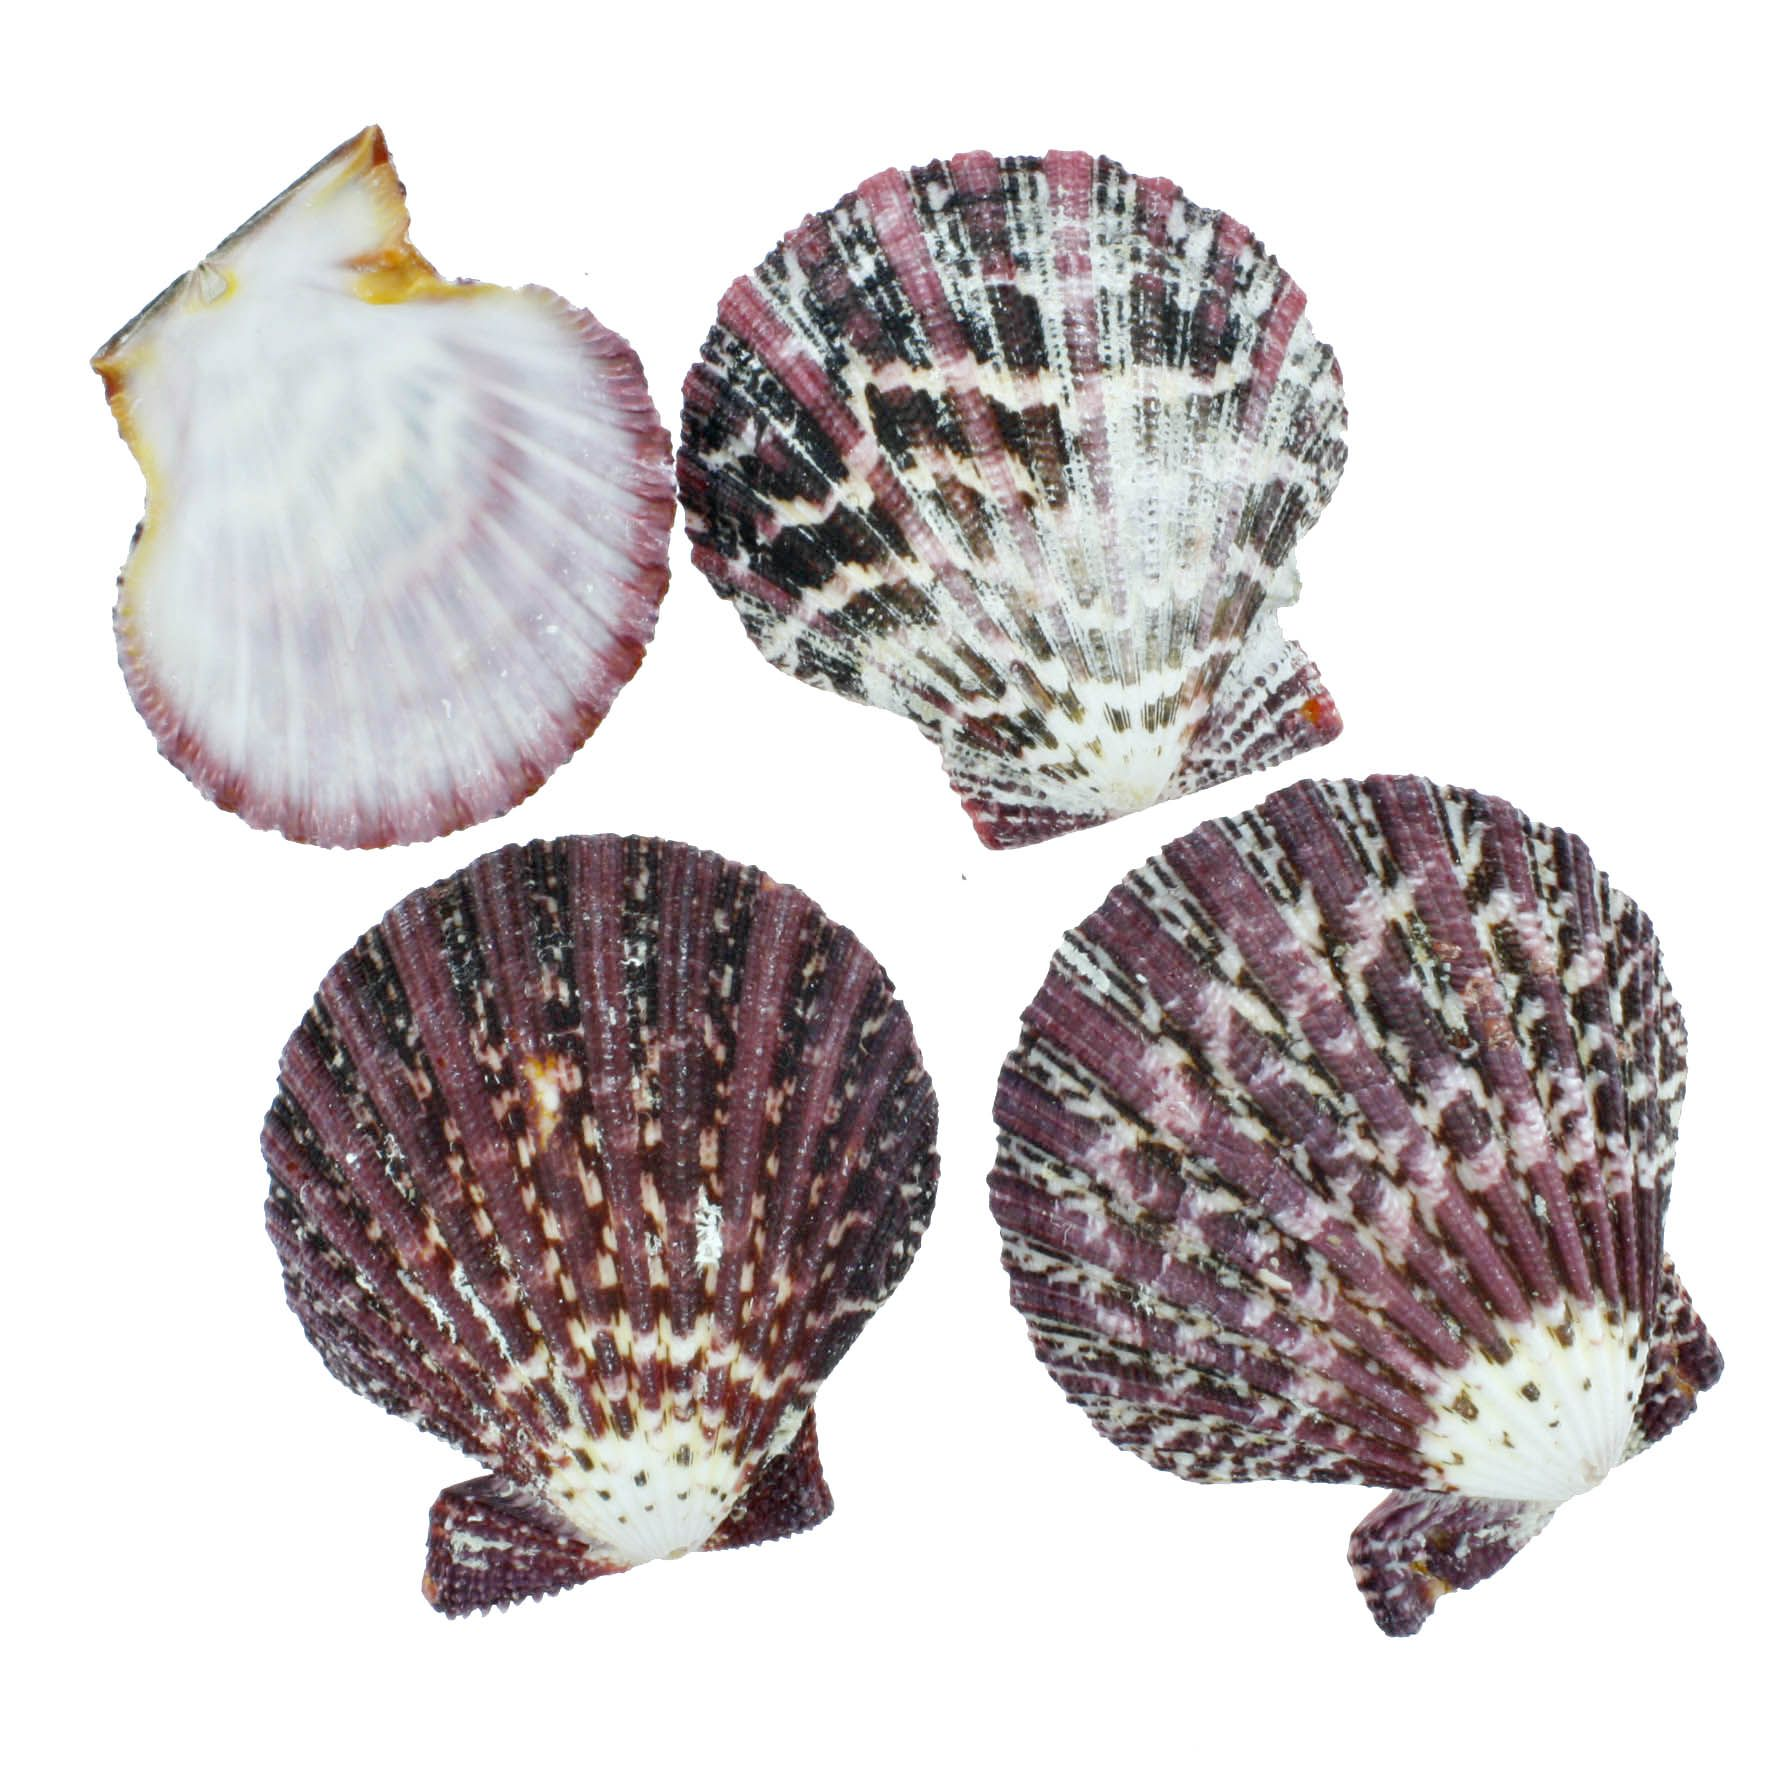 Concha - Gloria Pallium (Scallop Shell)  - Stéphanie Bijoux® - Peças para Bijuterias e Artesanato